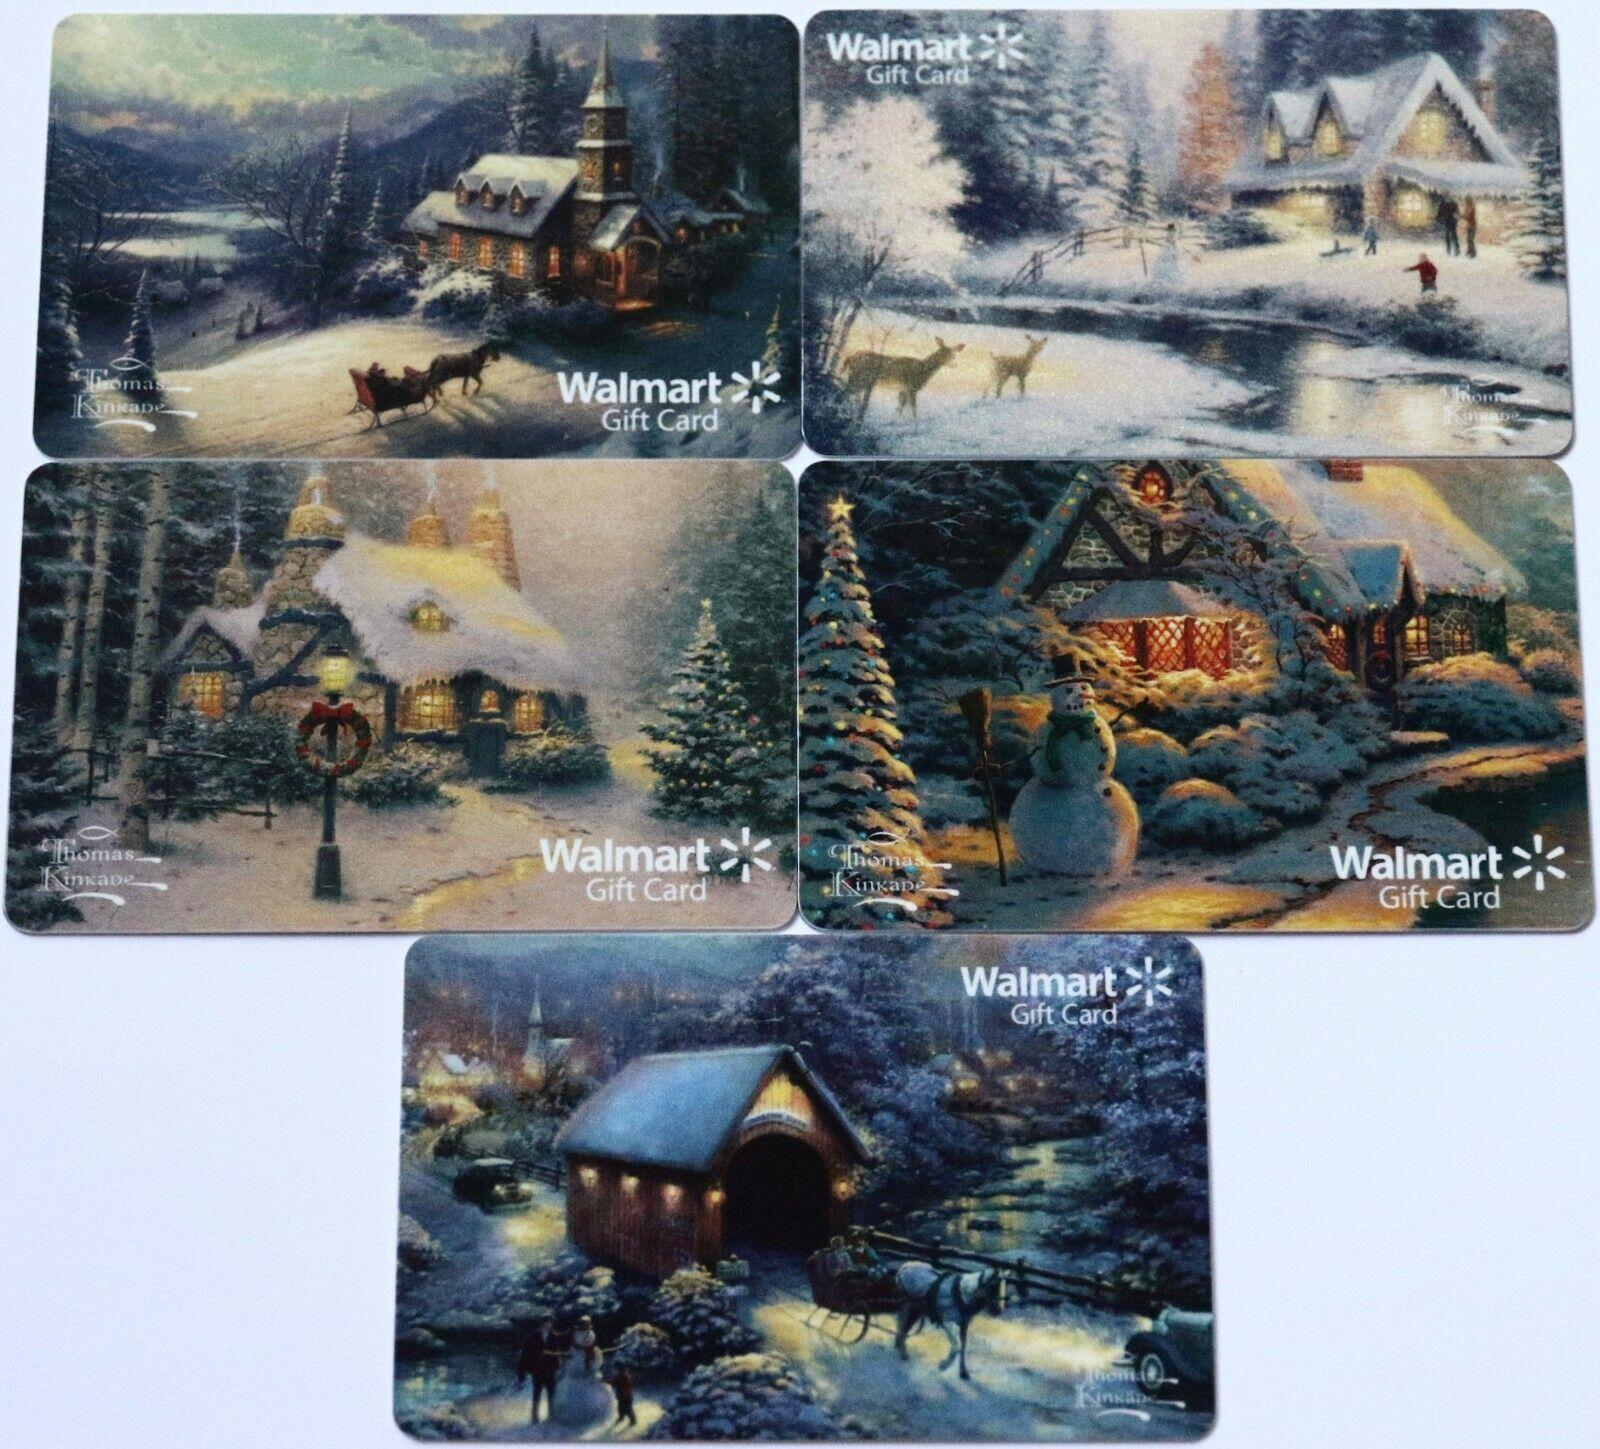 5 Walmart Christmas Winter Motifs Snowman Empty Gift Card Collectible Lot USA - $6.99